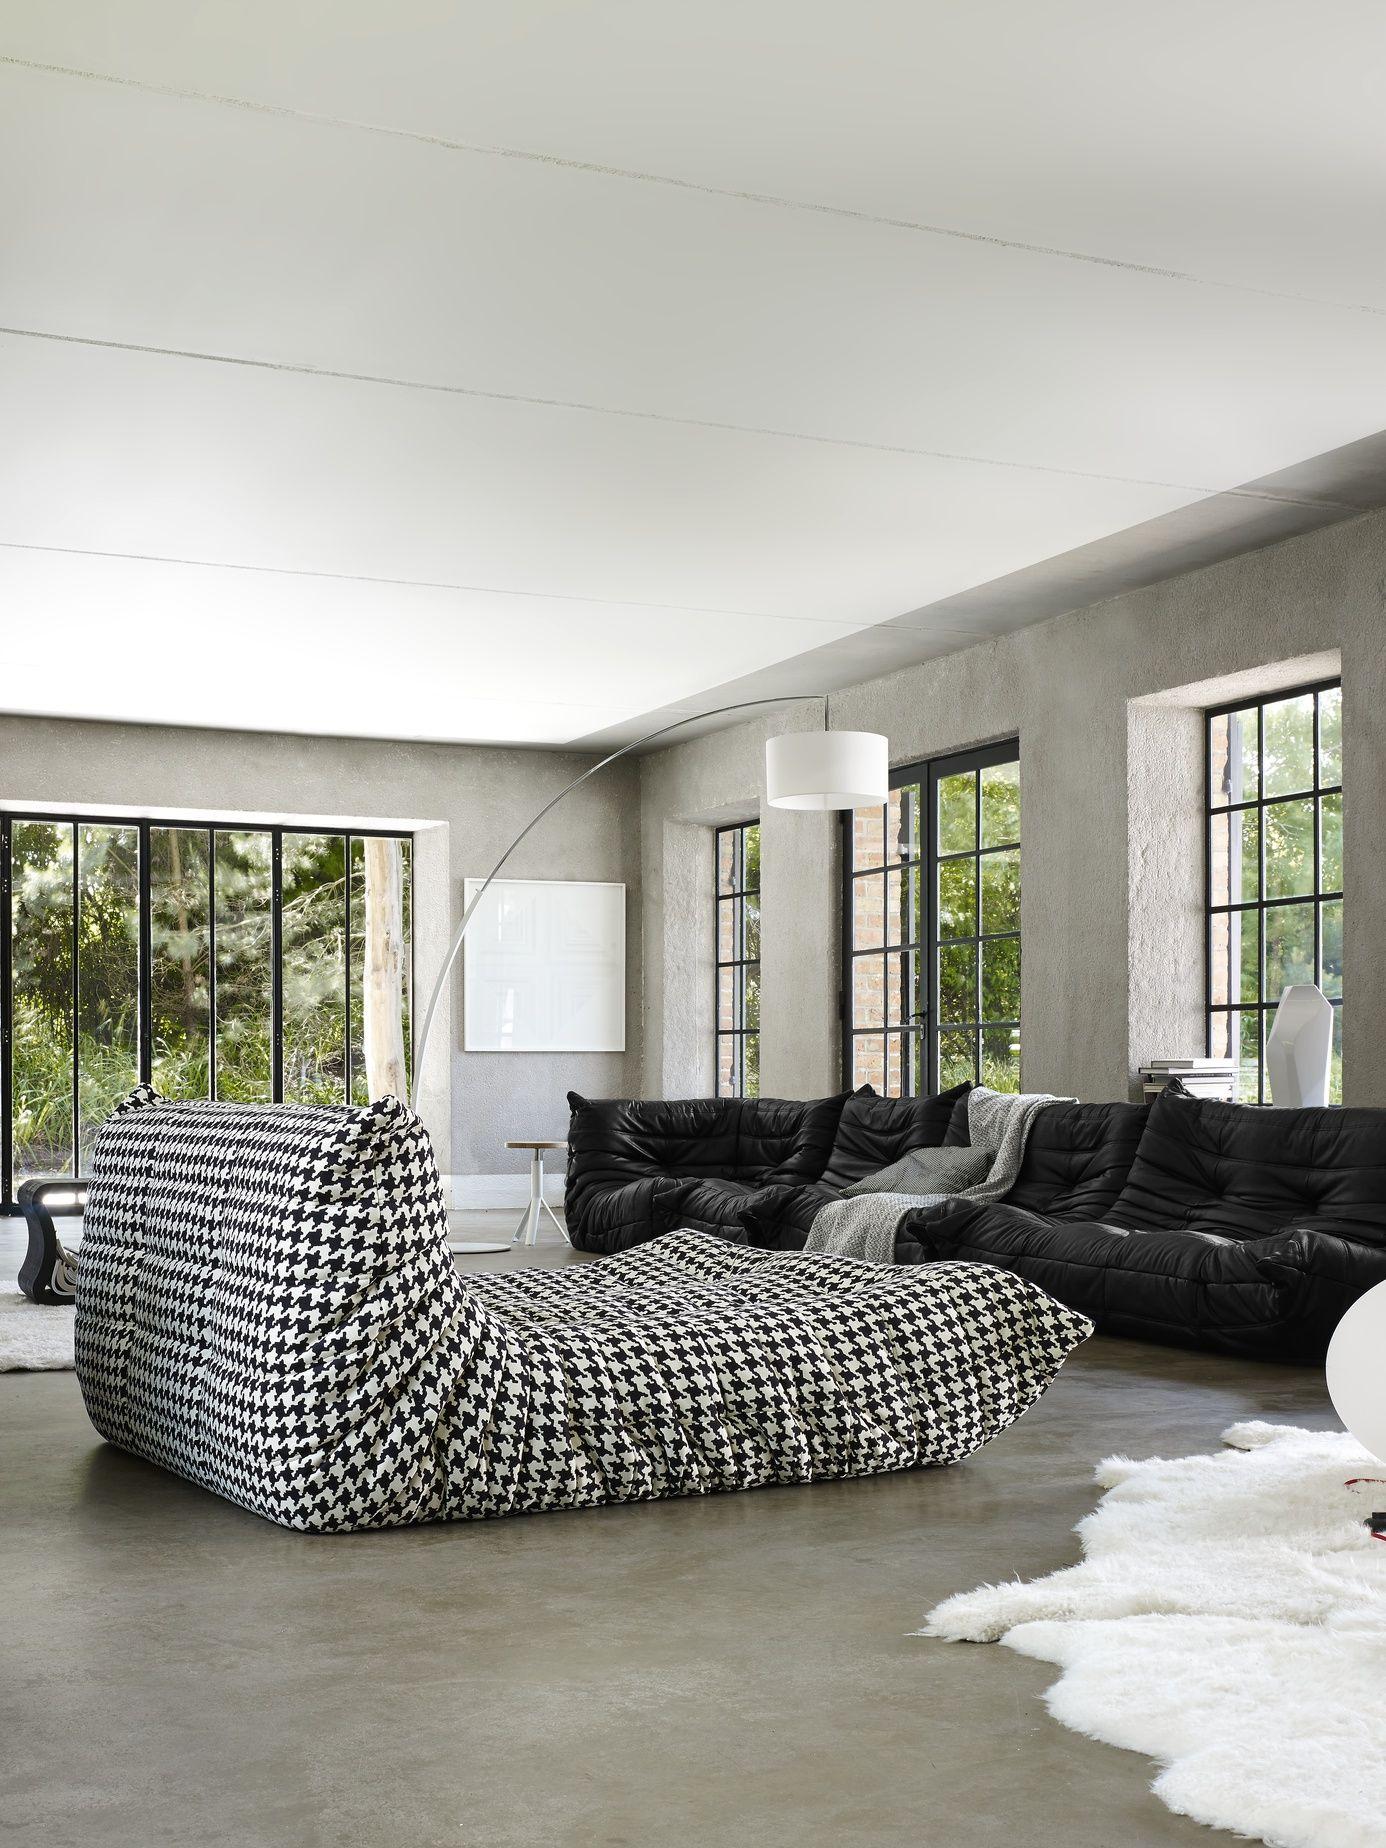 Togo upholstery designer michel ducaroy ligne roset chairs pinterest - Fauteuil ligne roset togo ...